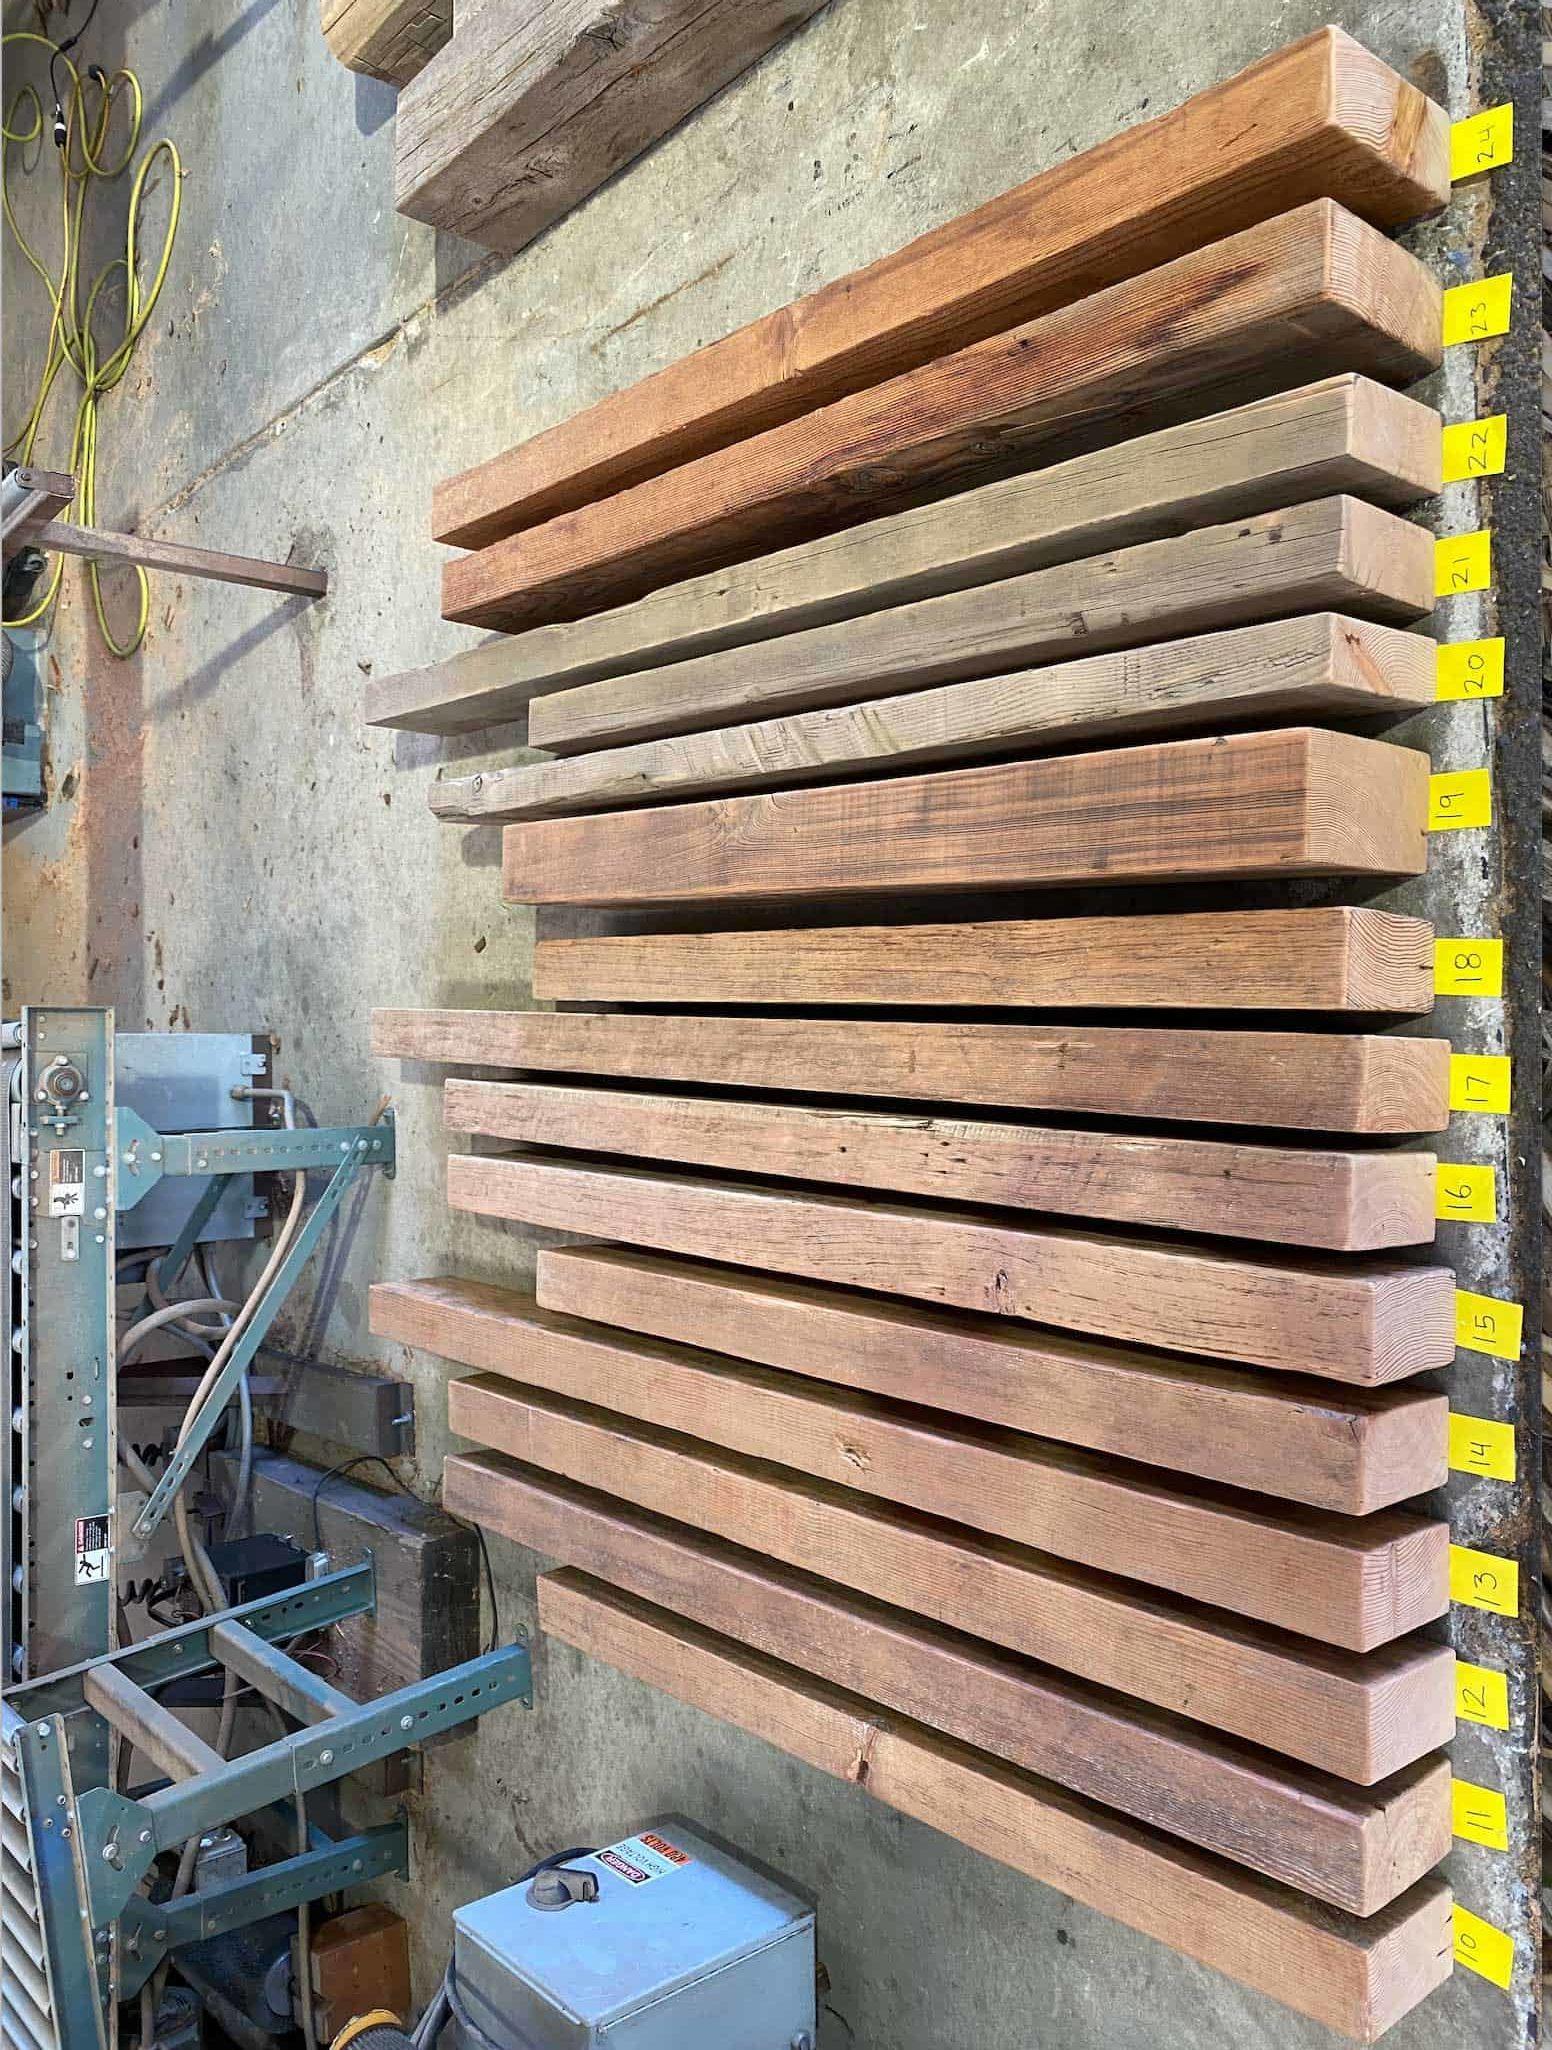 Sanded Douglas Fir Mantels e1588191349666 - Vintage Timberware